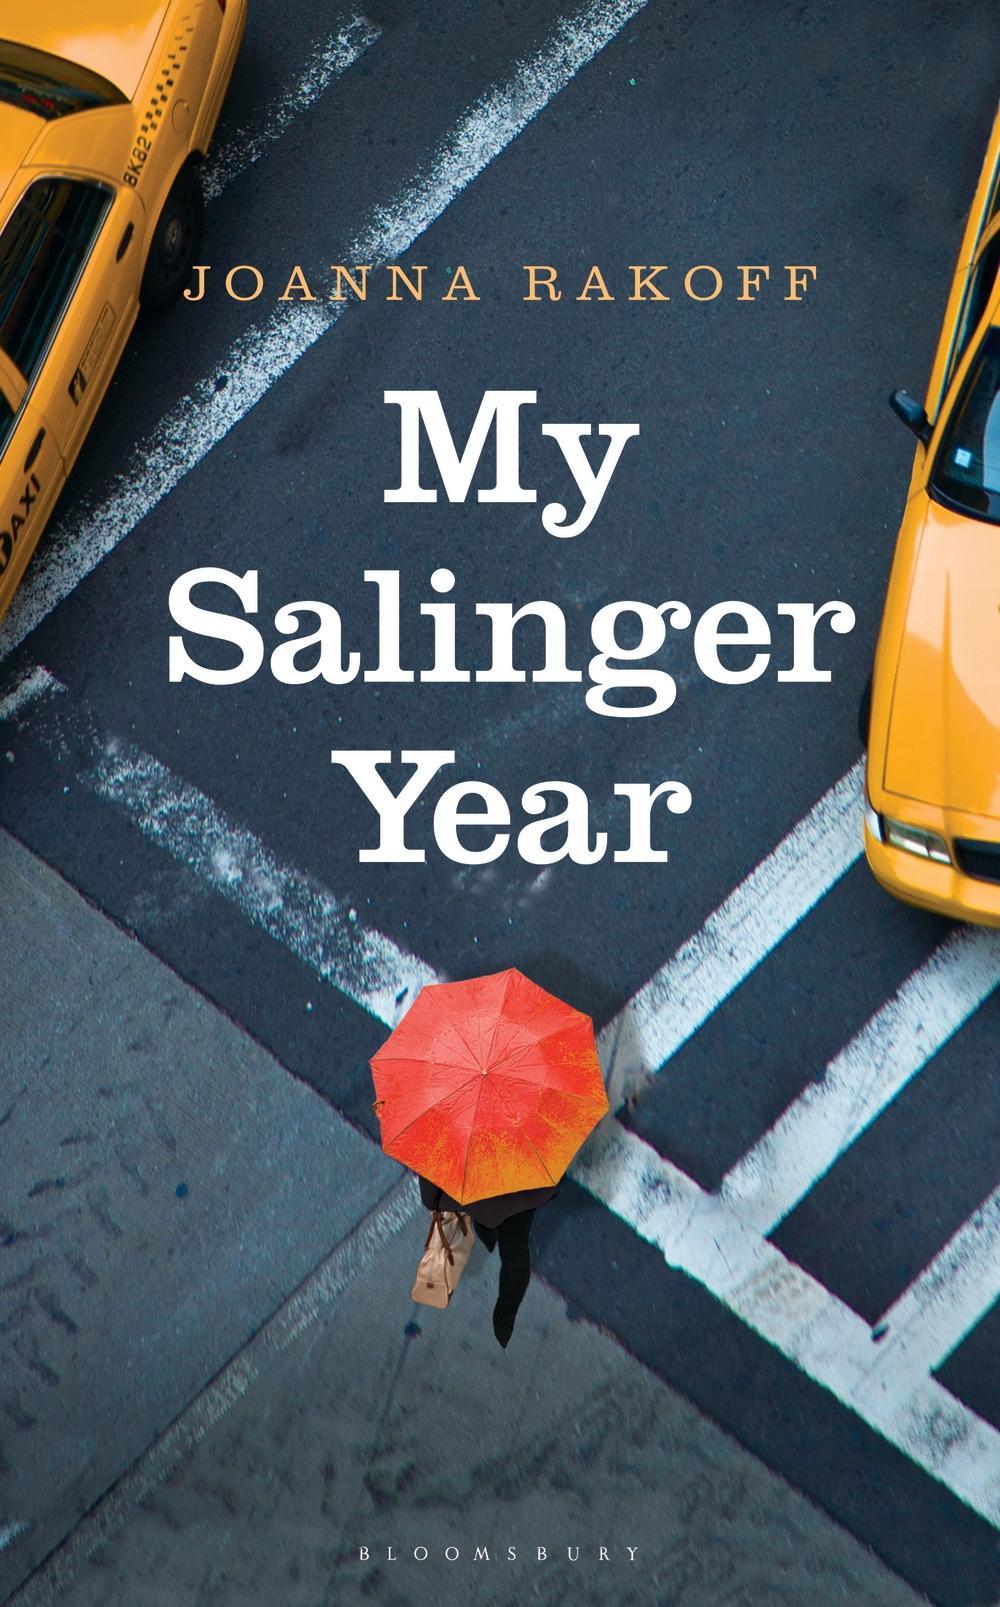 My Salinger Year by Joanna Rakoff - UK cover